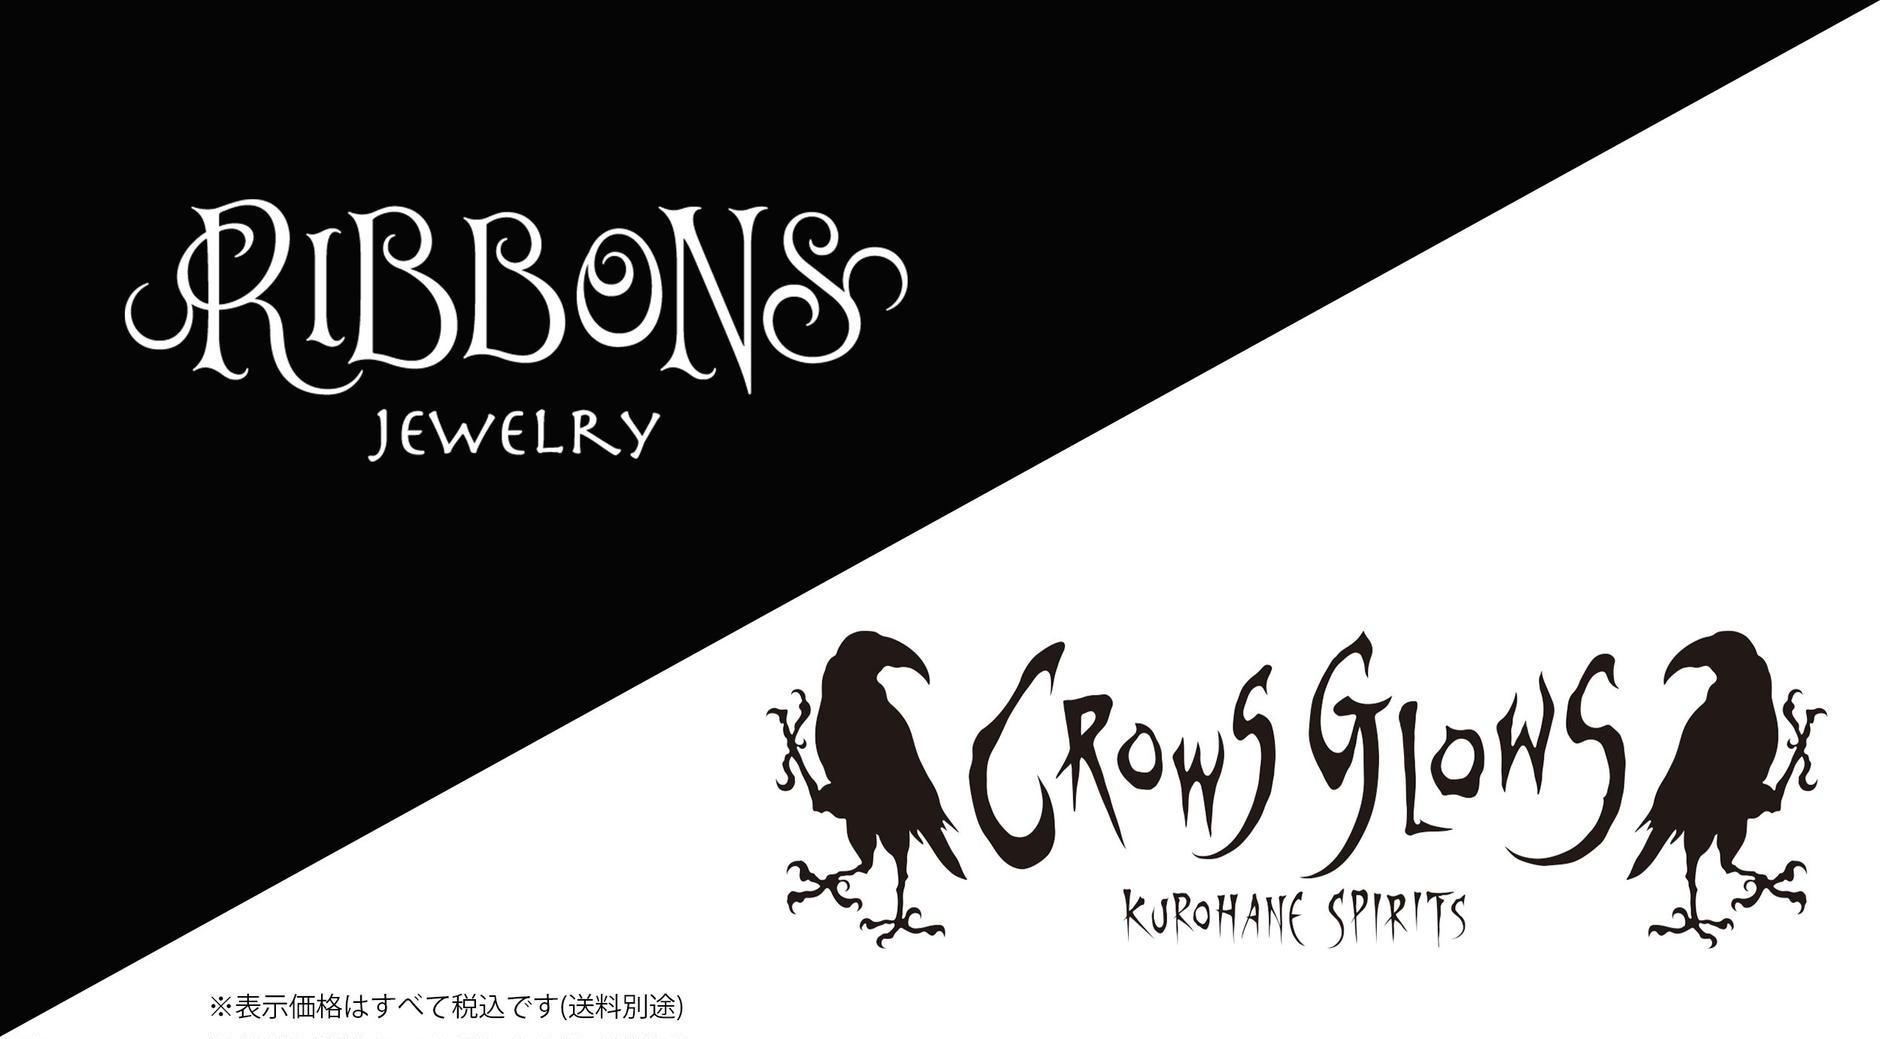 RIBBONS JEWELRY / CROWS GLOWS( シルバーアクセサリー)